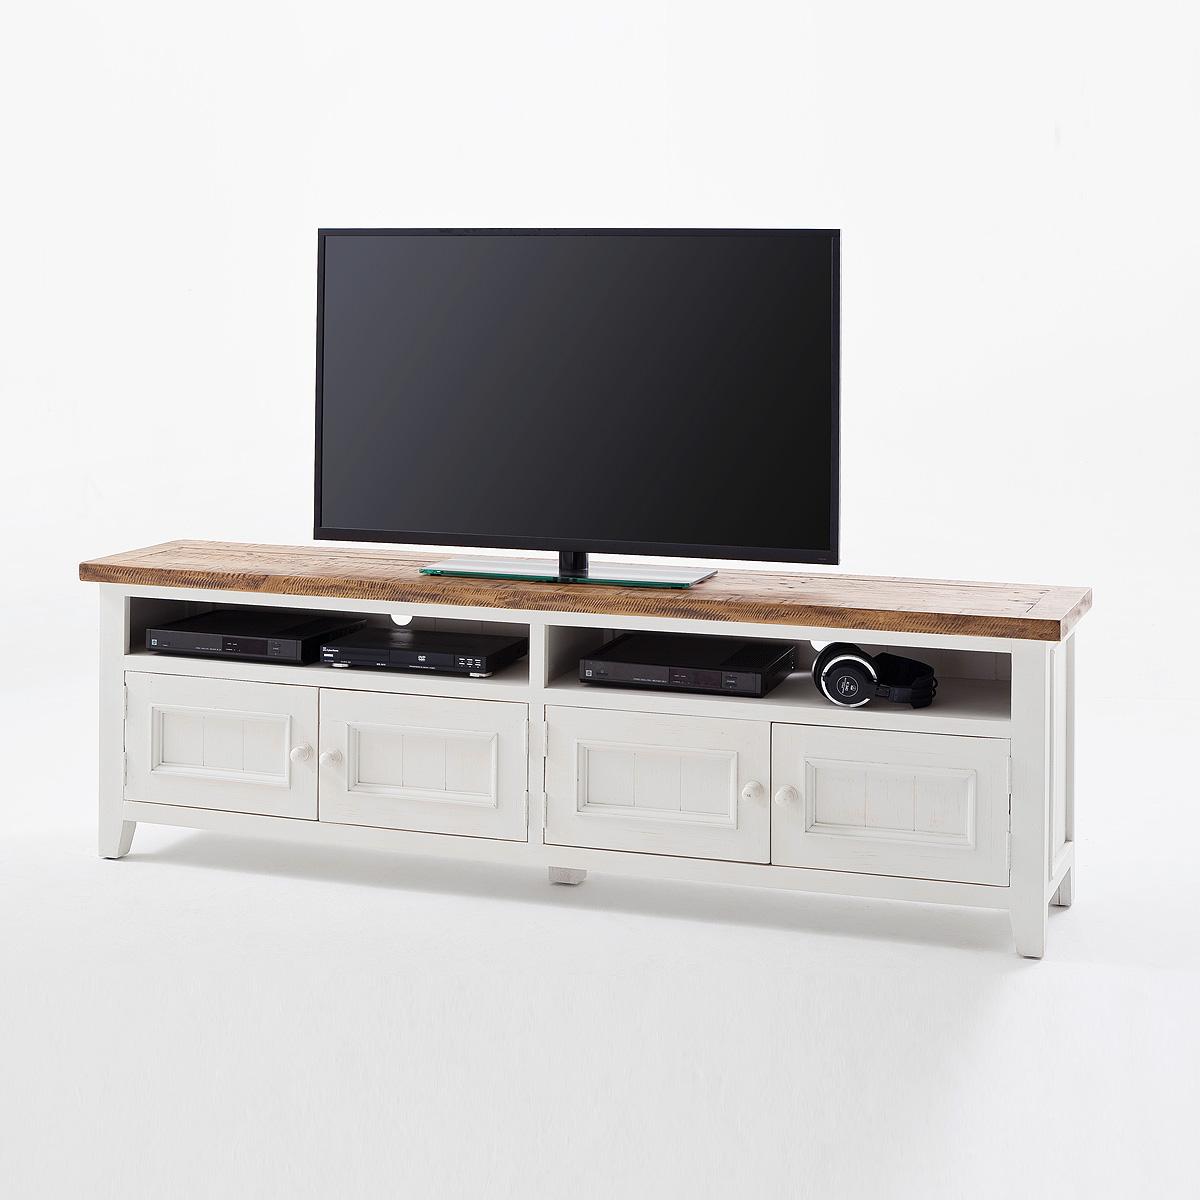 Tv board opus unterschrank lowboard in kiefer massiv weiß im ...